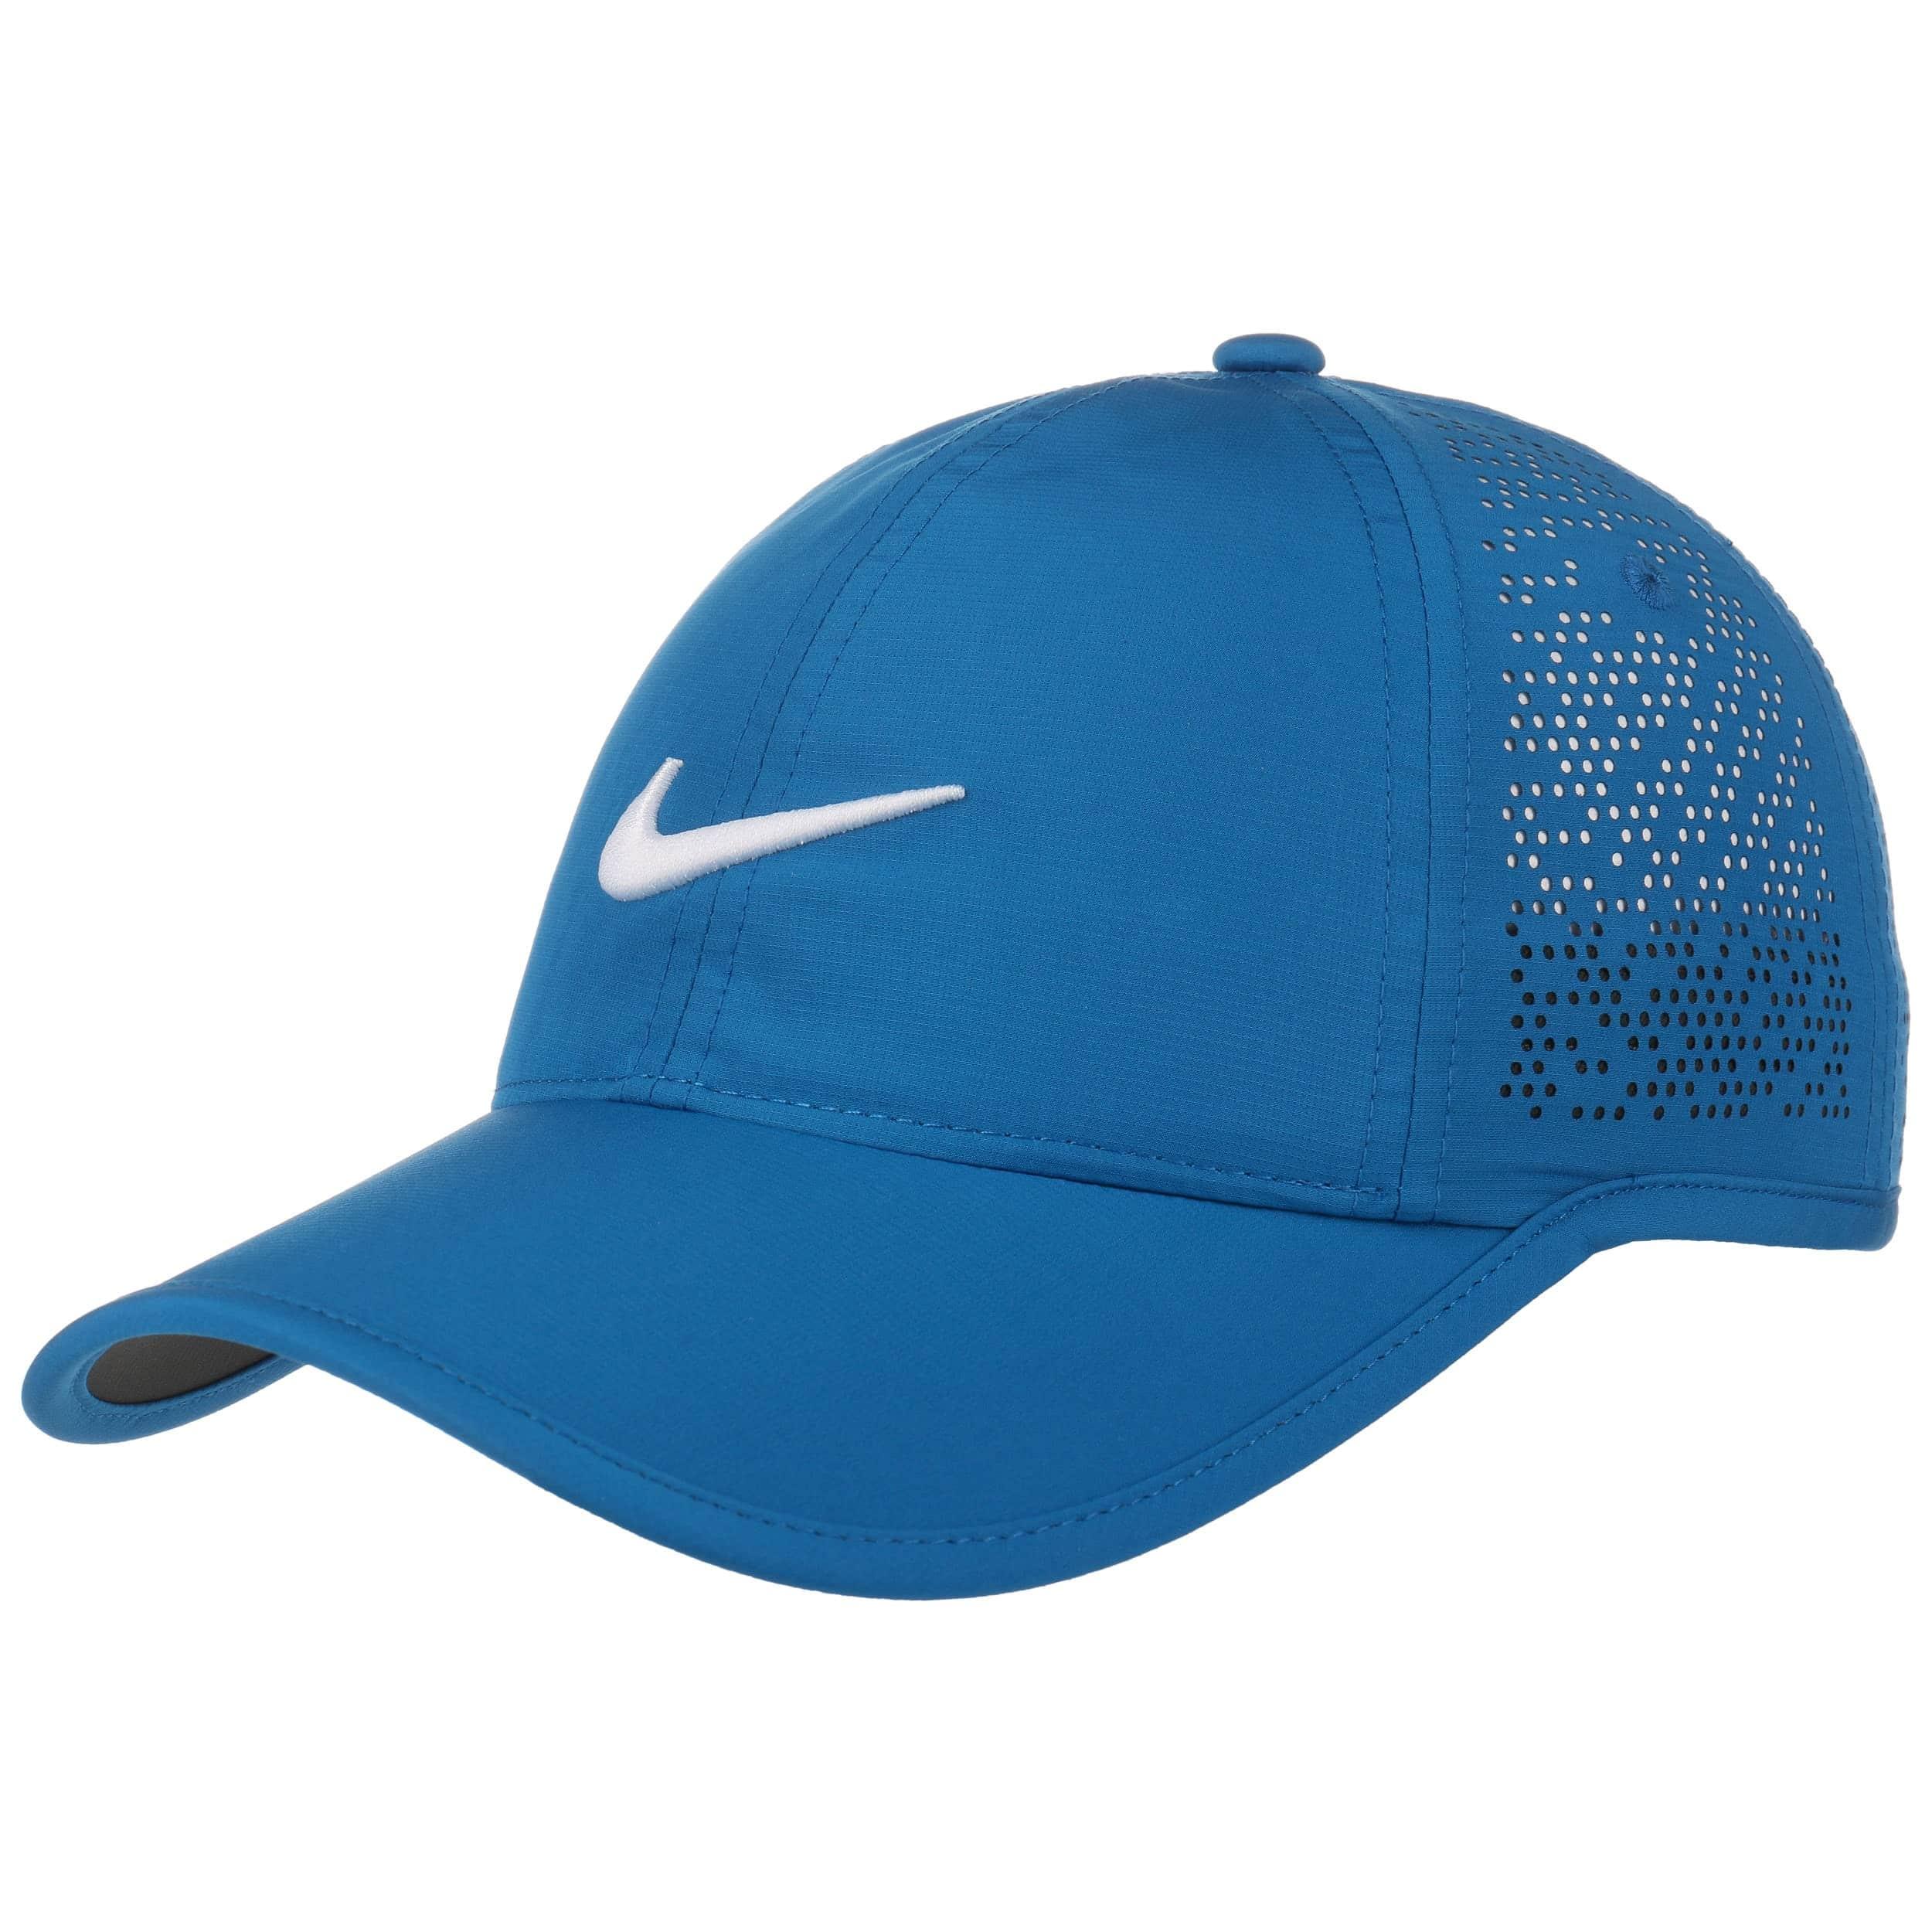 dbb6e2d5ed4 ... get swoosh perforation cap by nike blue 6 a9d57 07cad